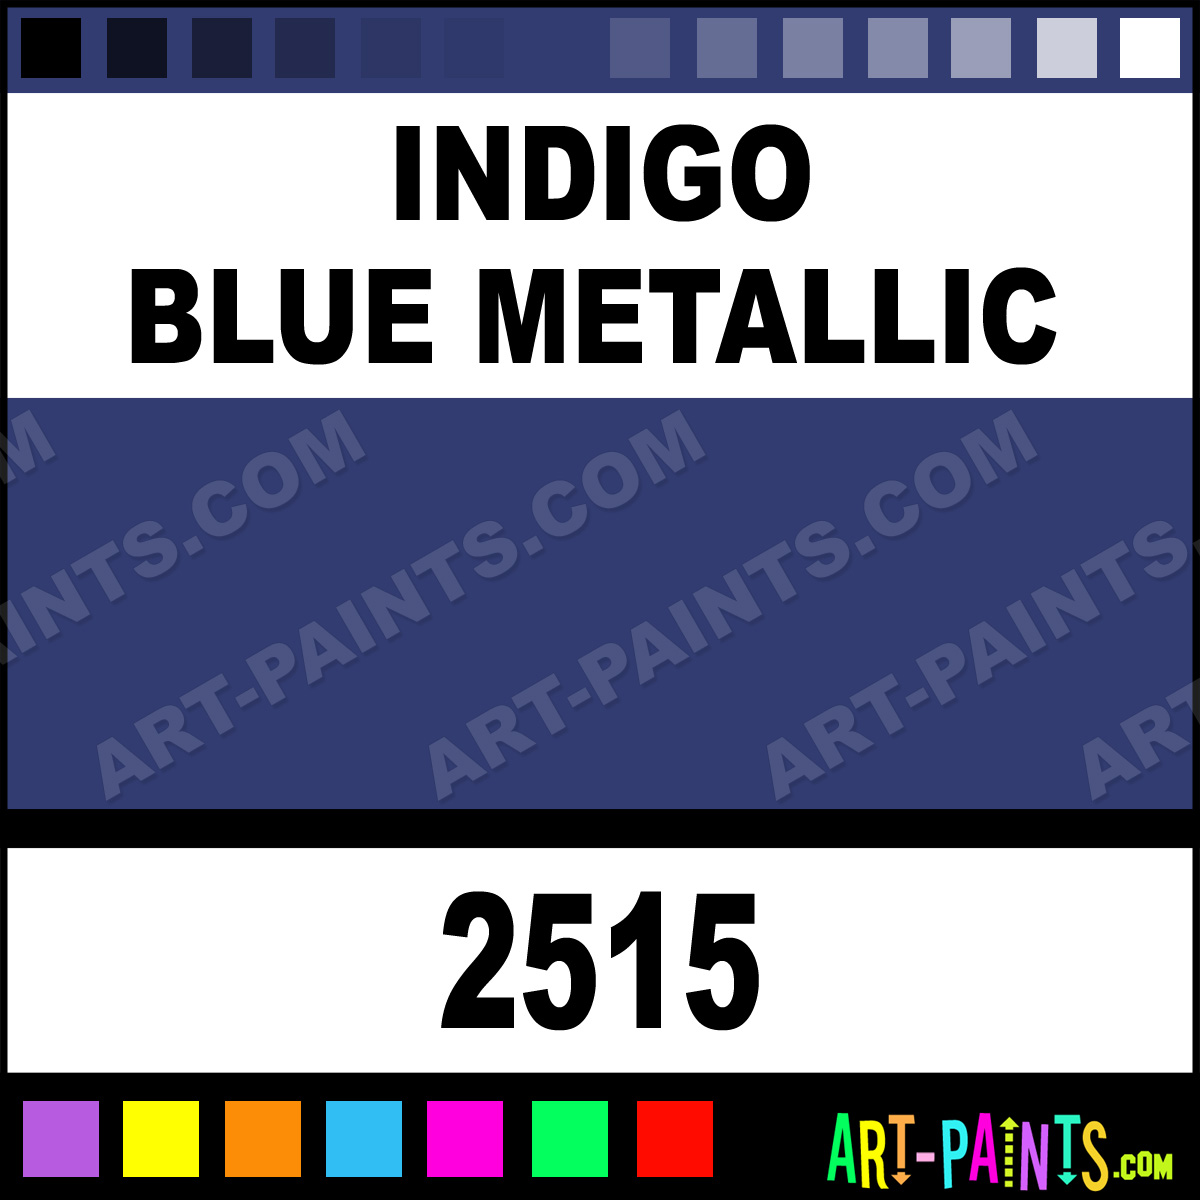 Chevrolet Indigo Blue Metallic Paint Code